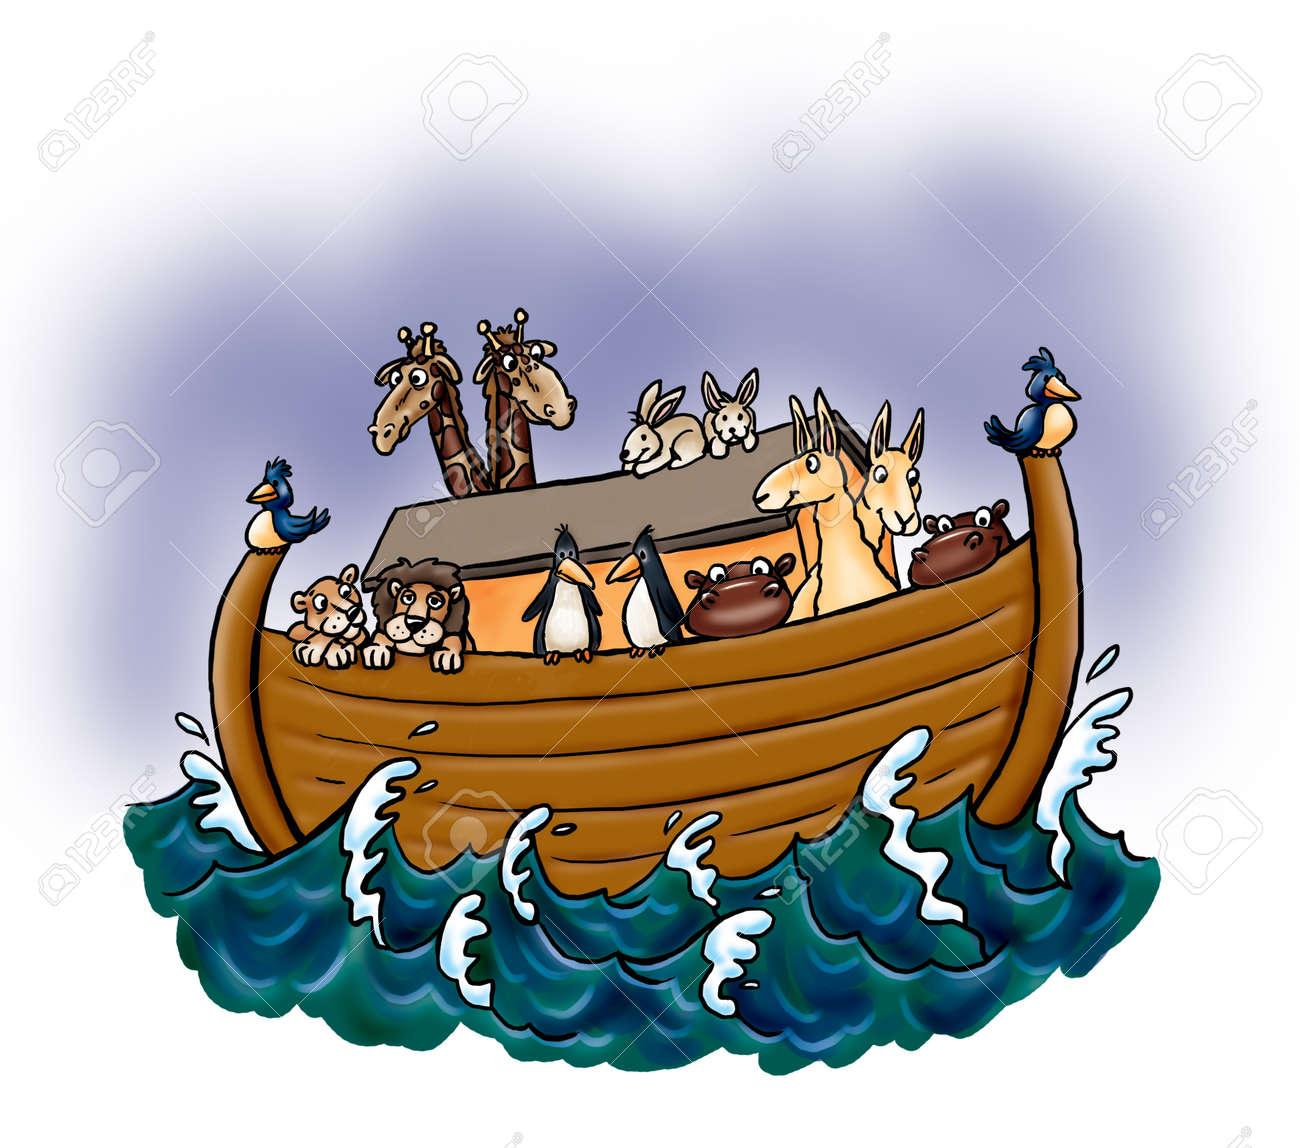 Noah's Ark with Animals - 126584161